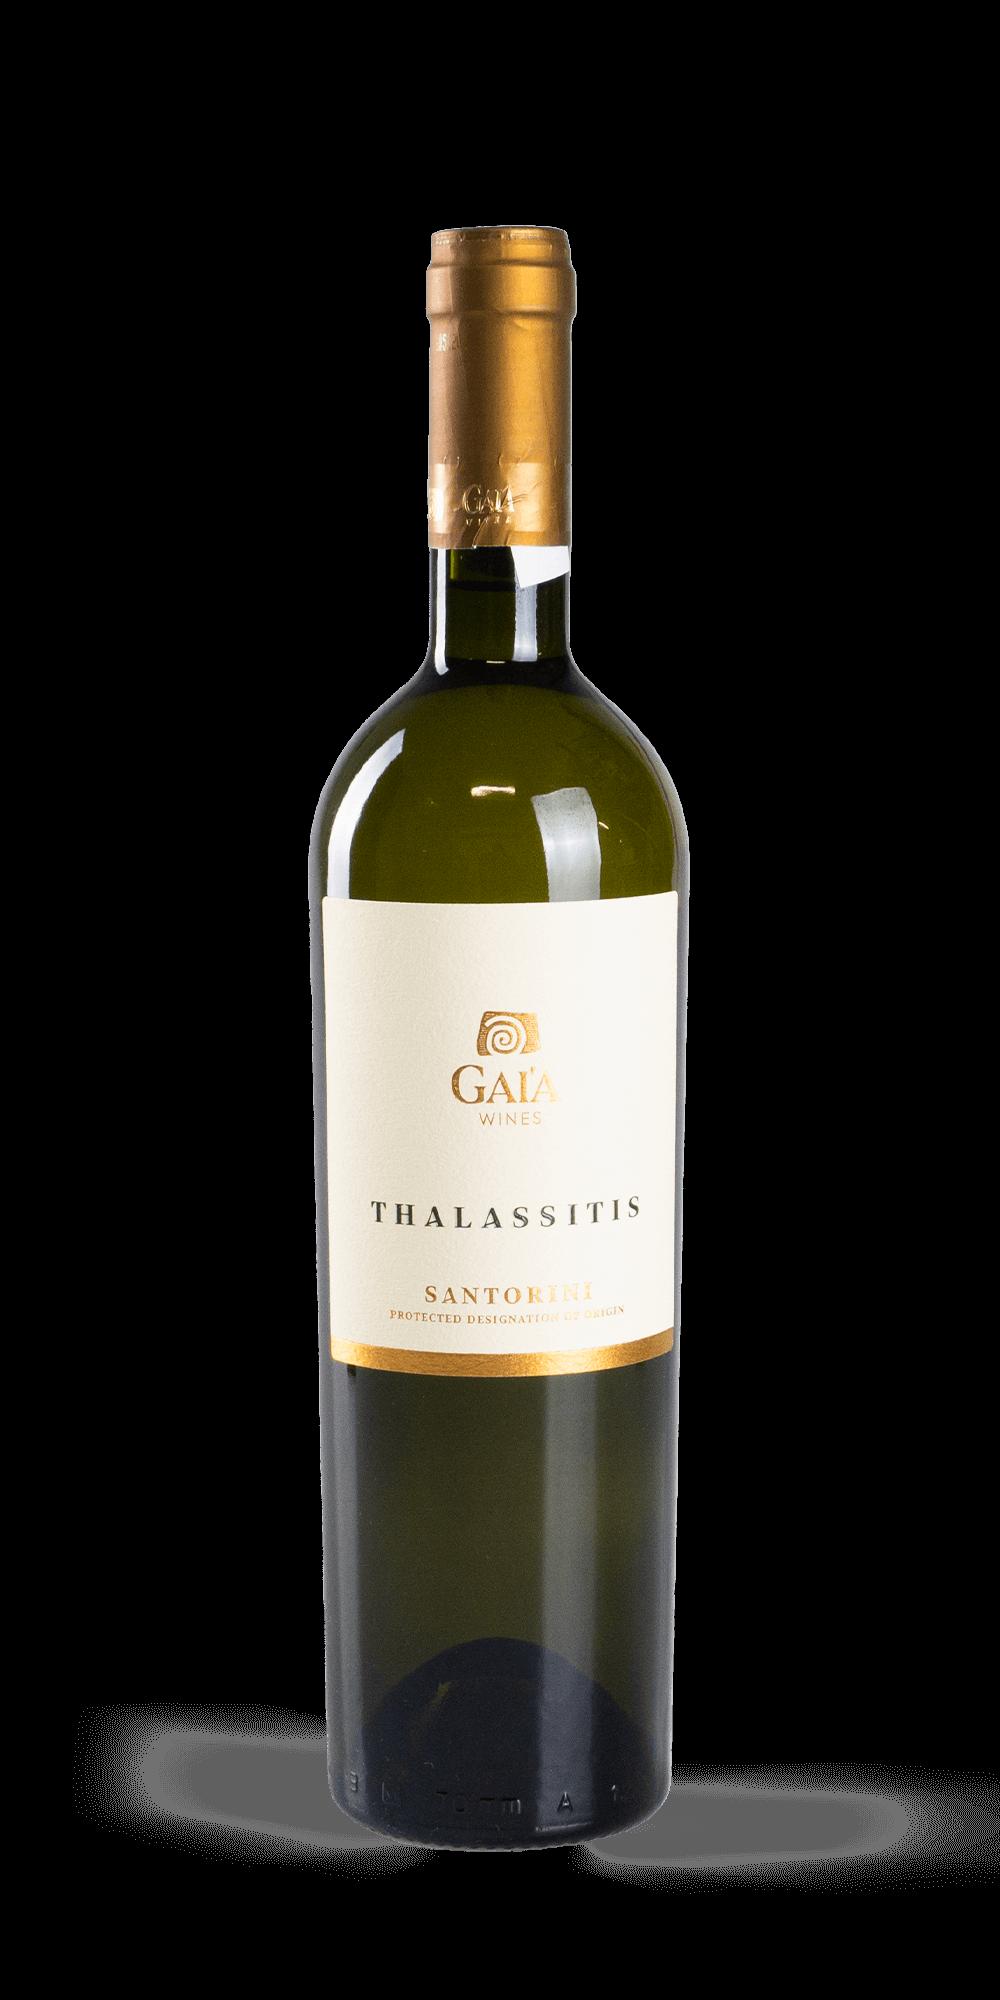 Thalassitis 2019 - Gaia Wines